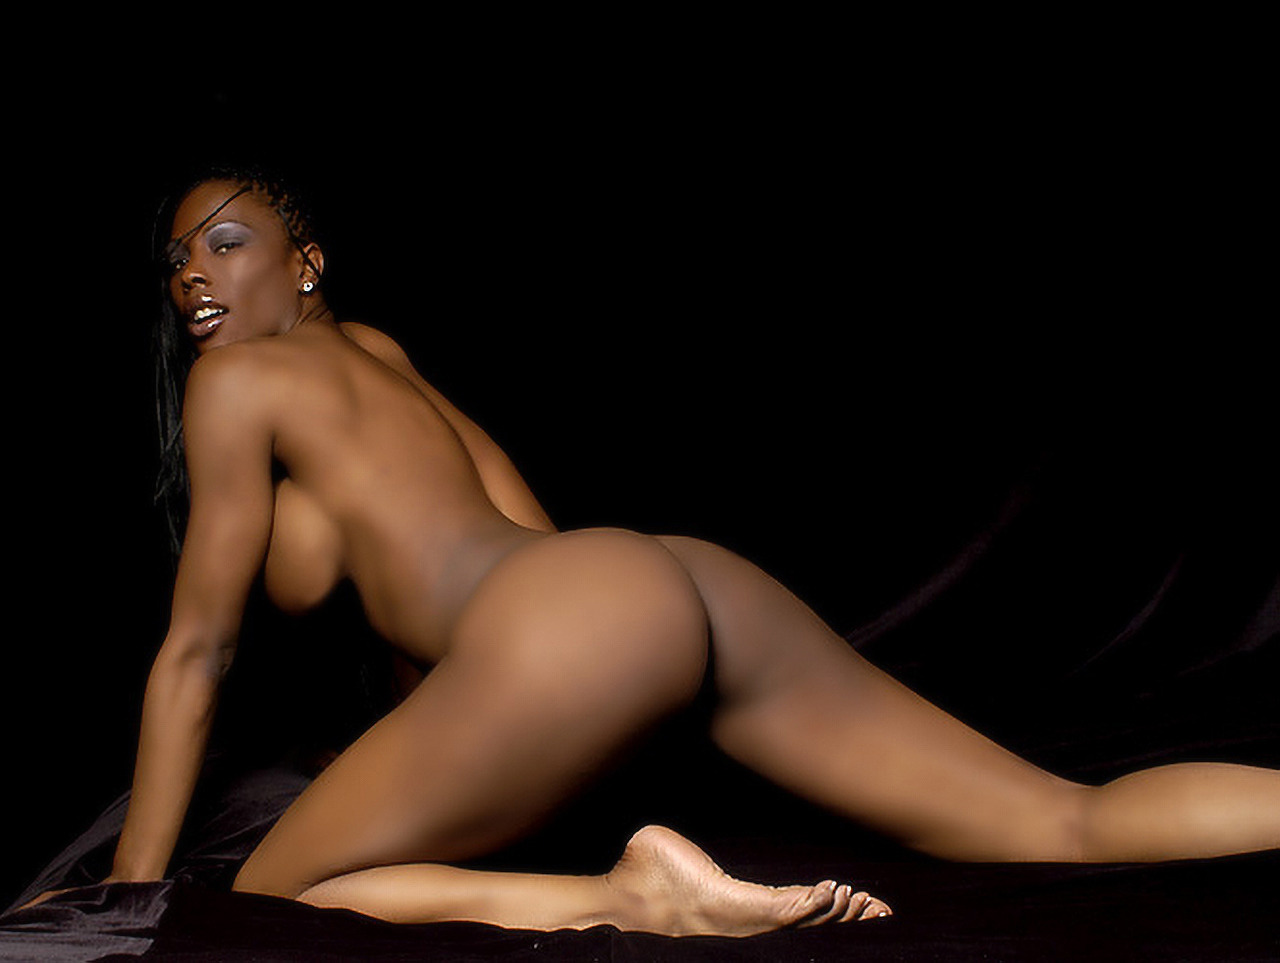 tumblr taboo nude